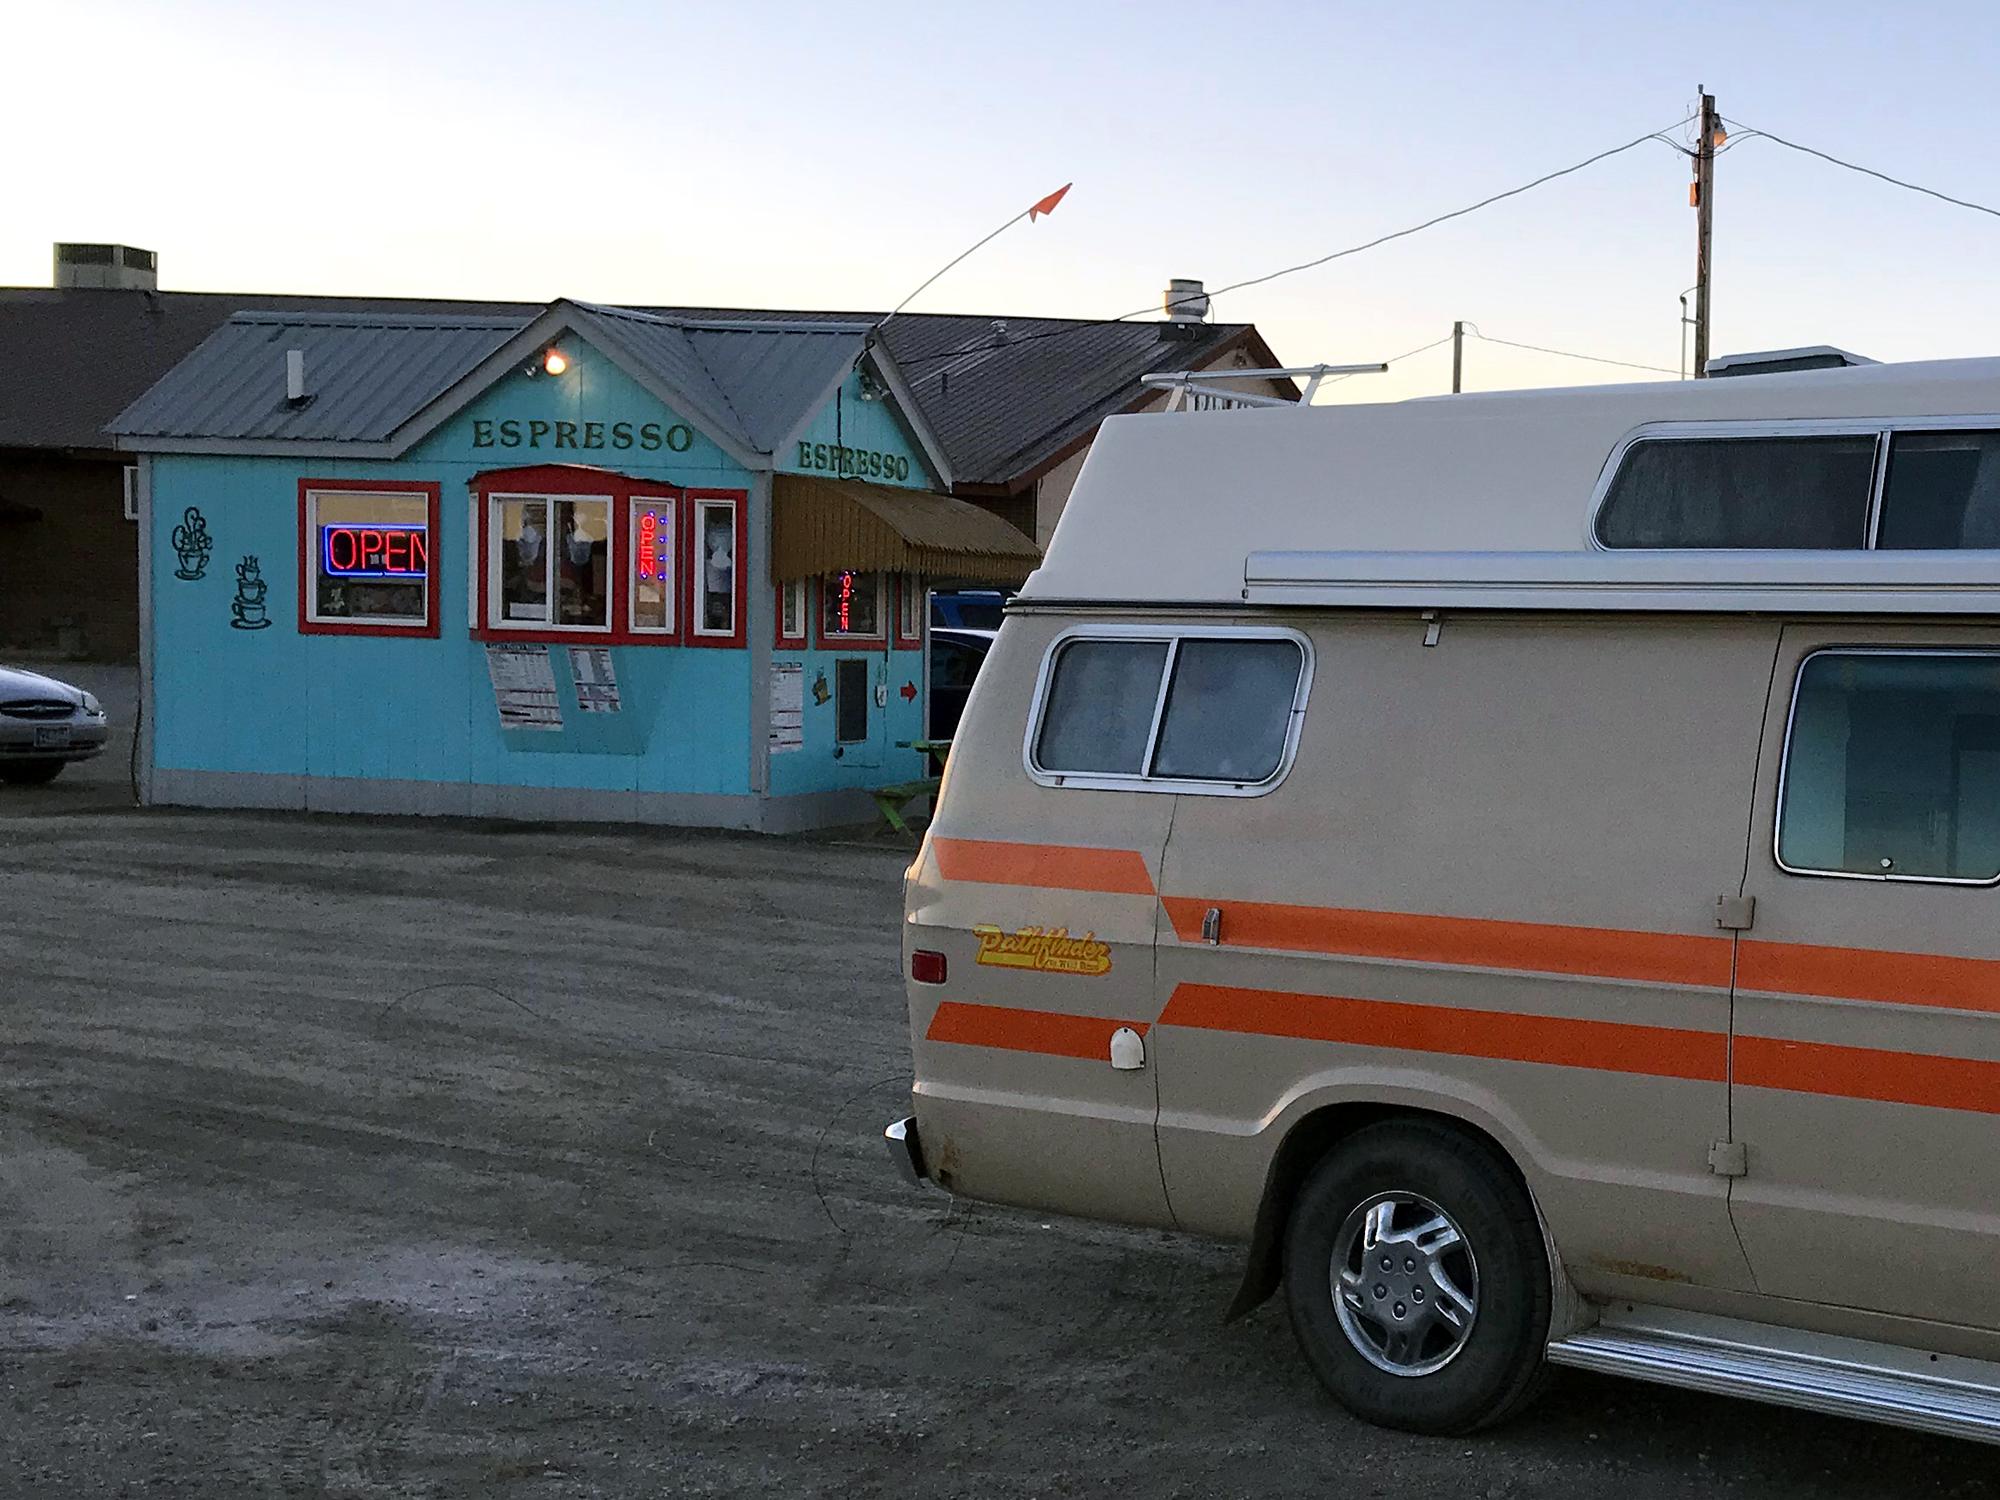 Generic Van Life - Shelby Espresso Bar